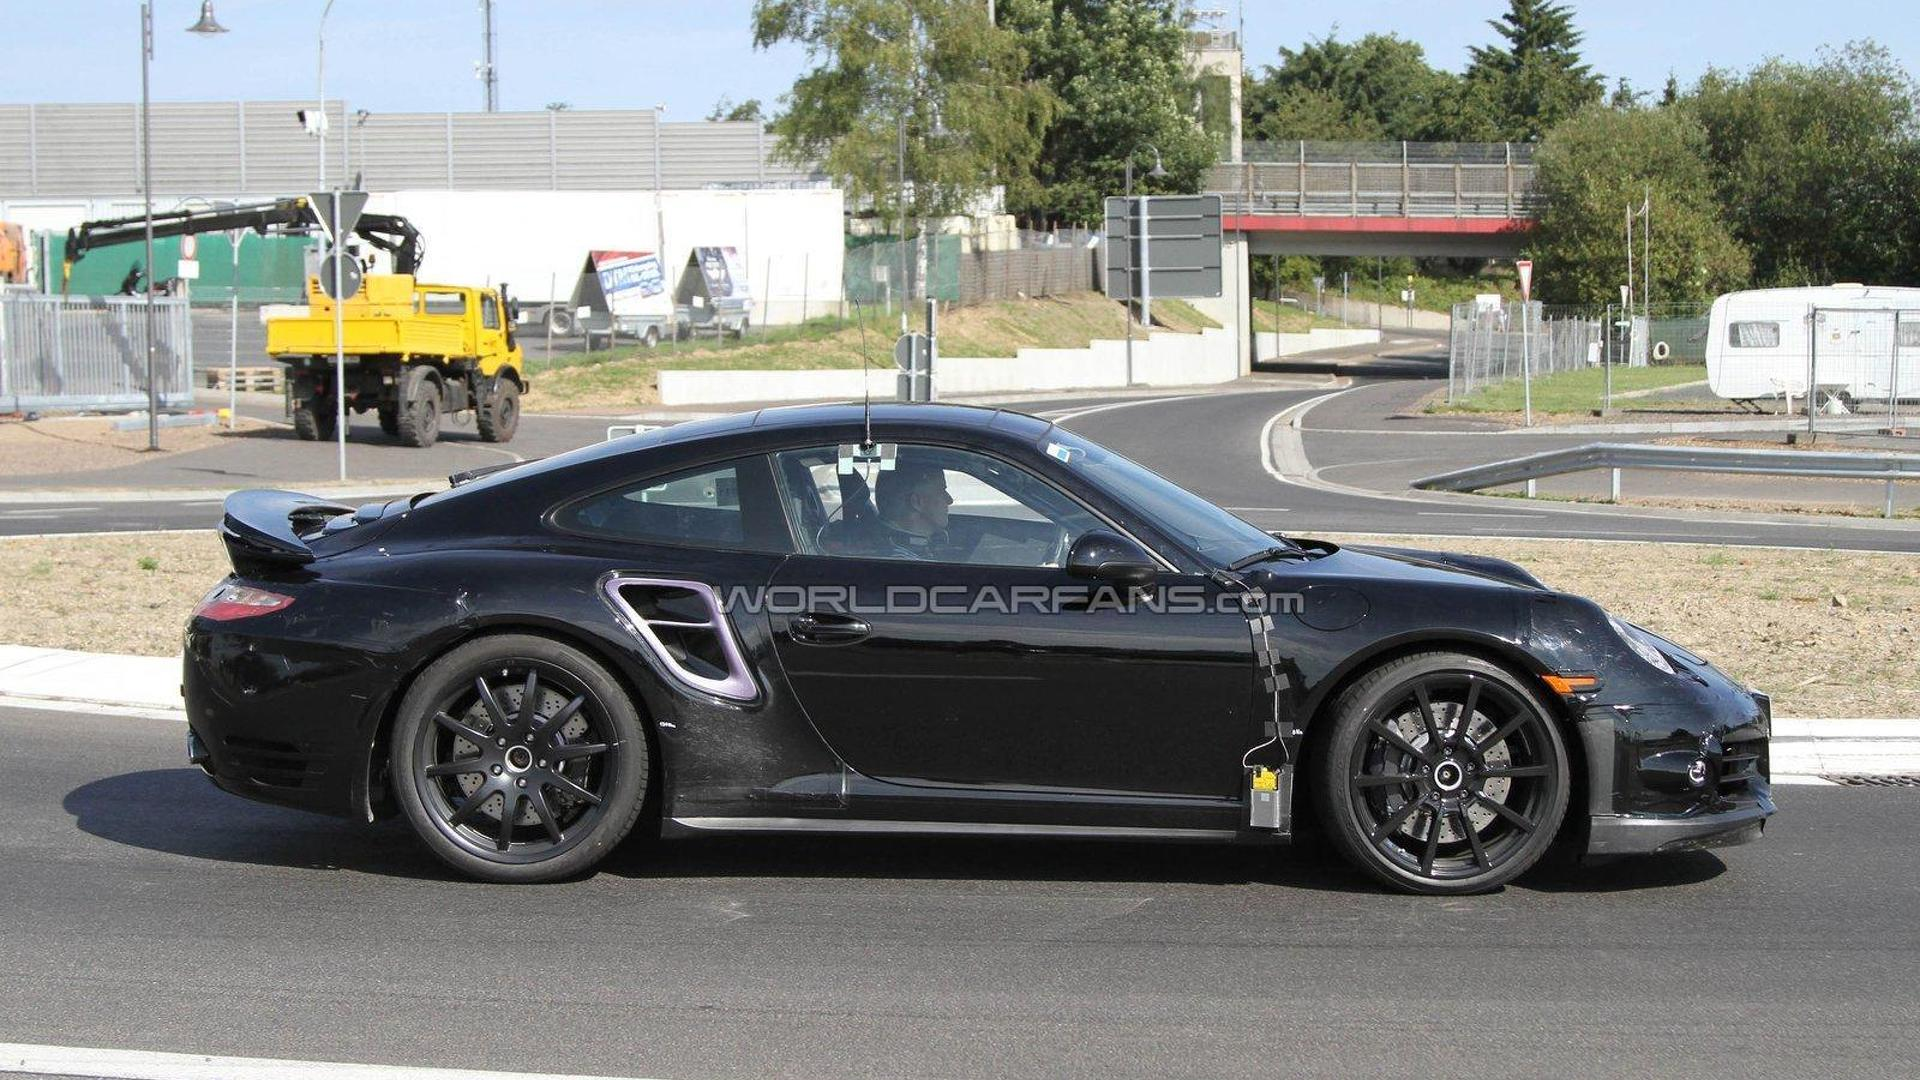 2012 Porsche 911 Carrera (991) spied on the street [video]